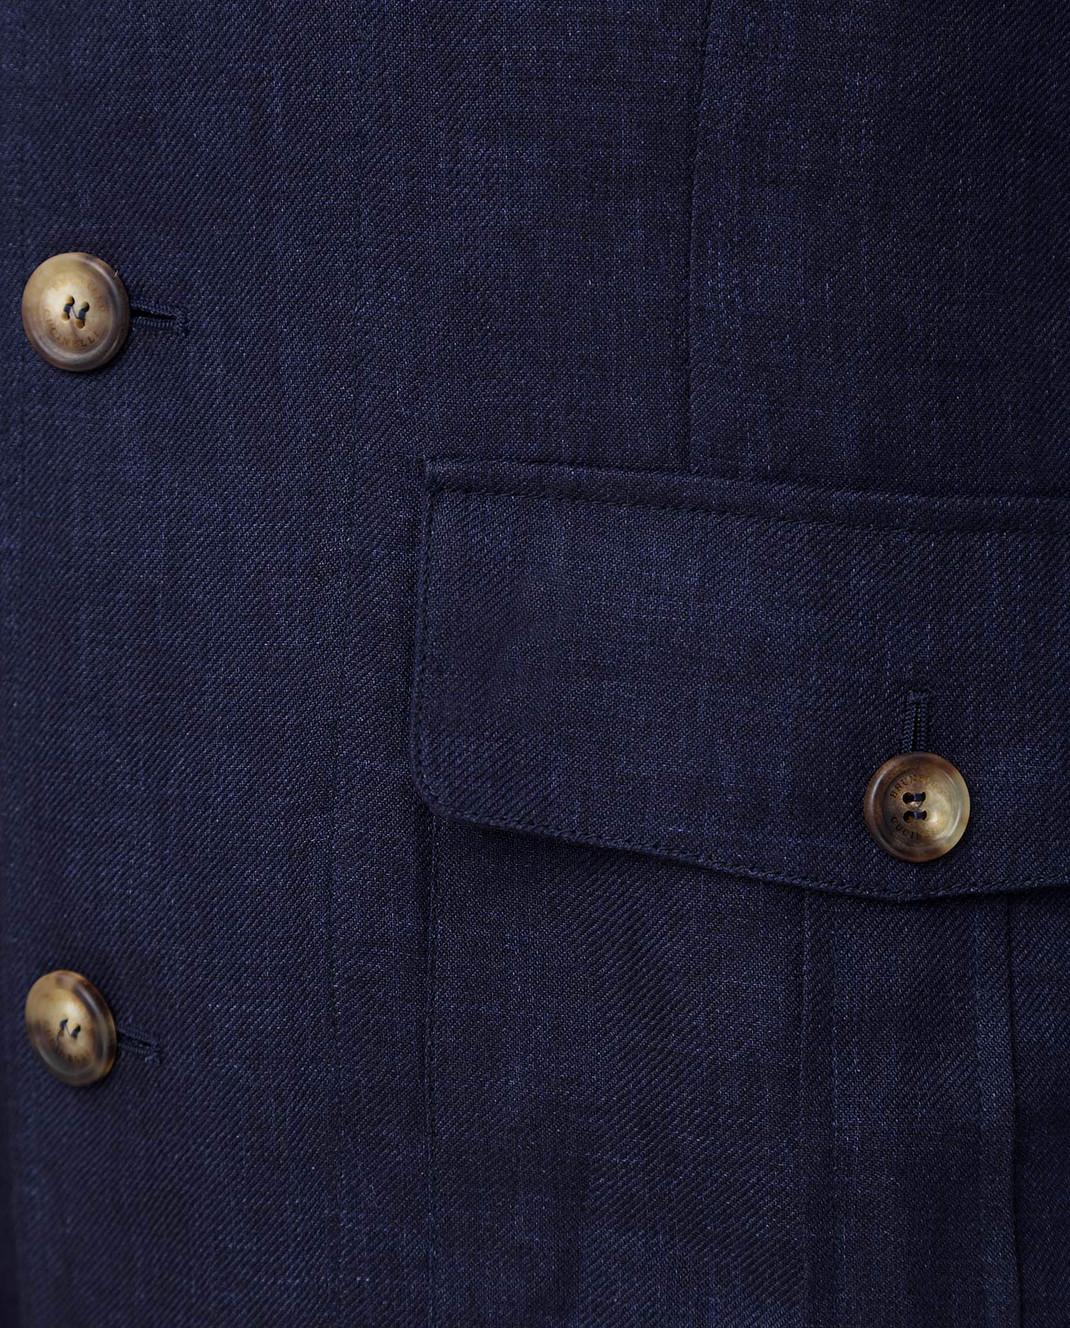 Brunello Cucinelli Синяя куртка MD4176848 изображение 5